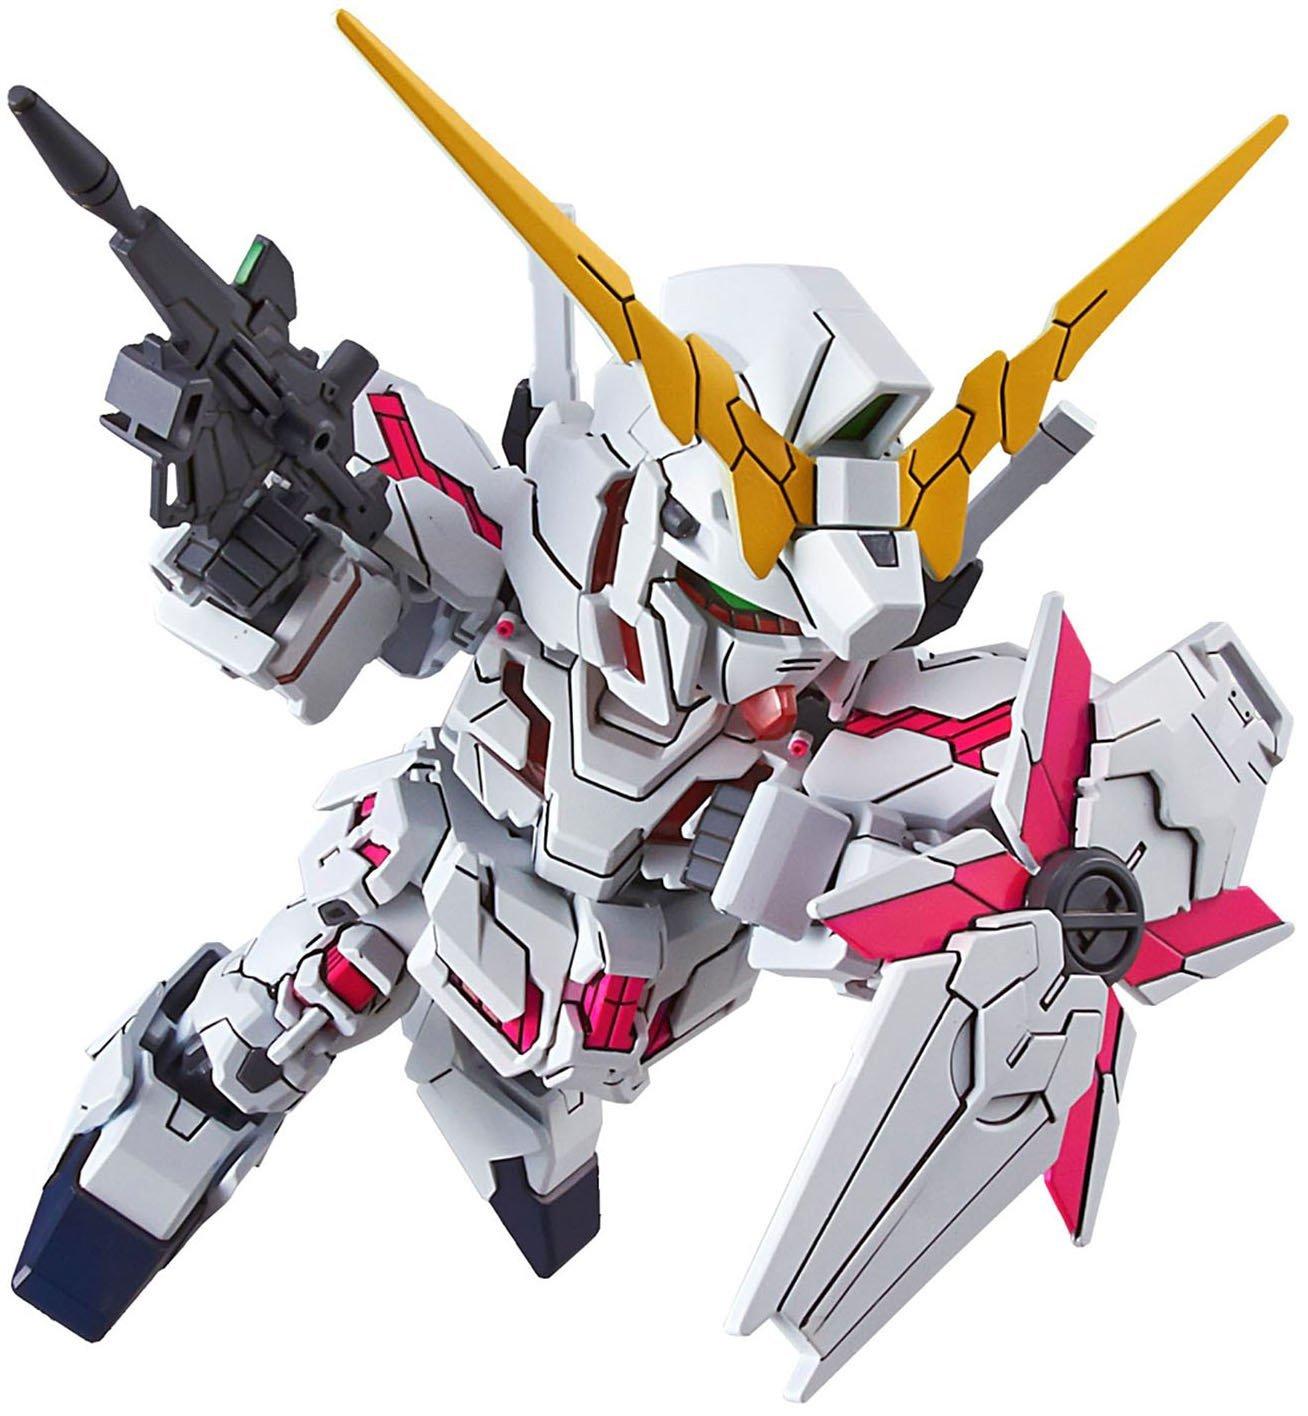 Berühmt Gundam Irre Goldrahmen Zeitgenössisch - Rahmen Ideen ...